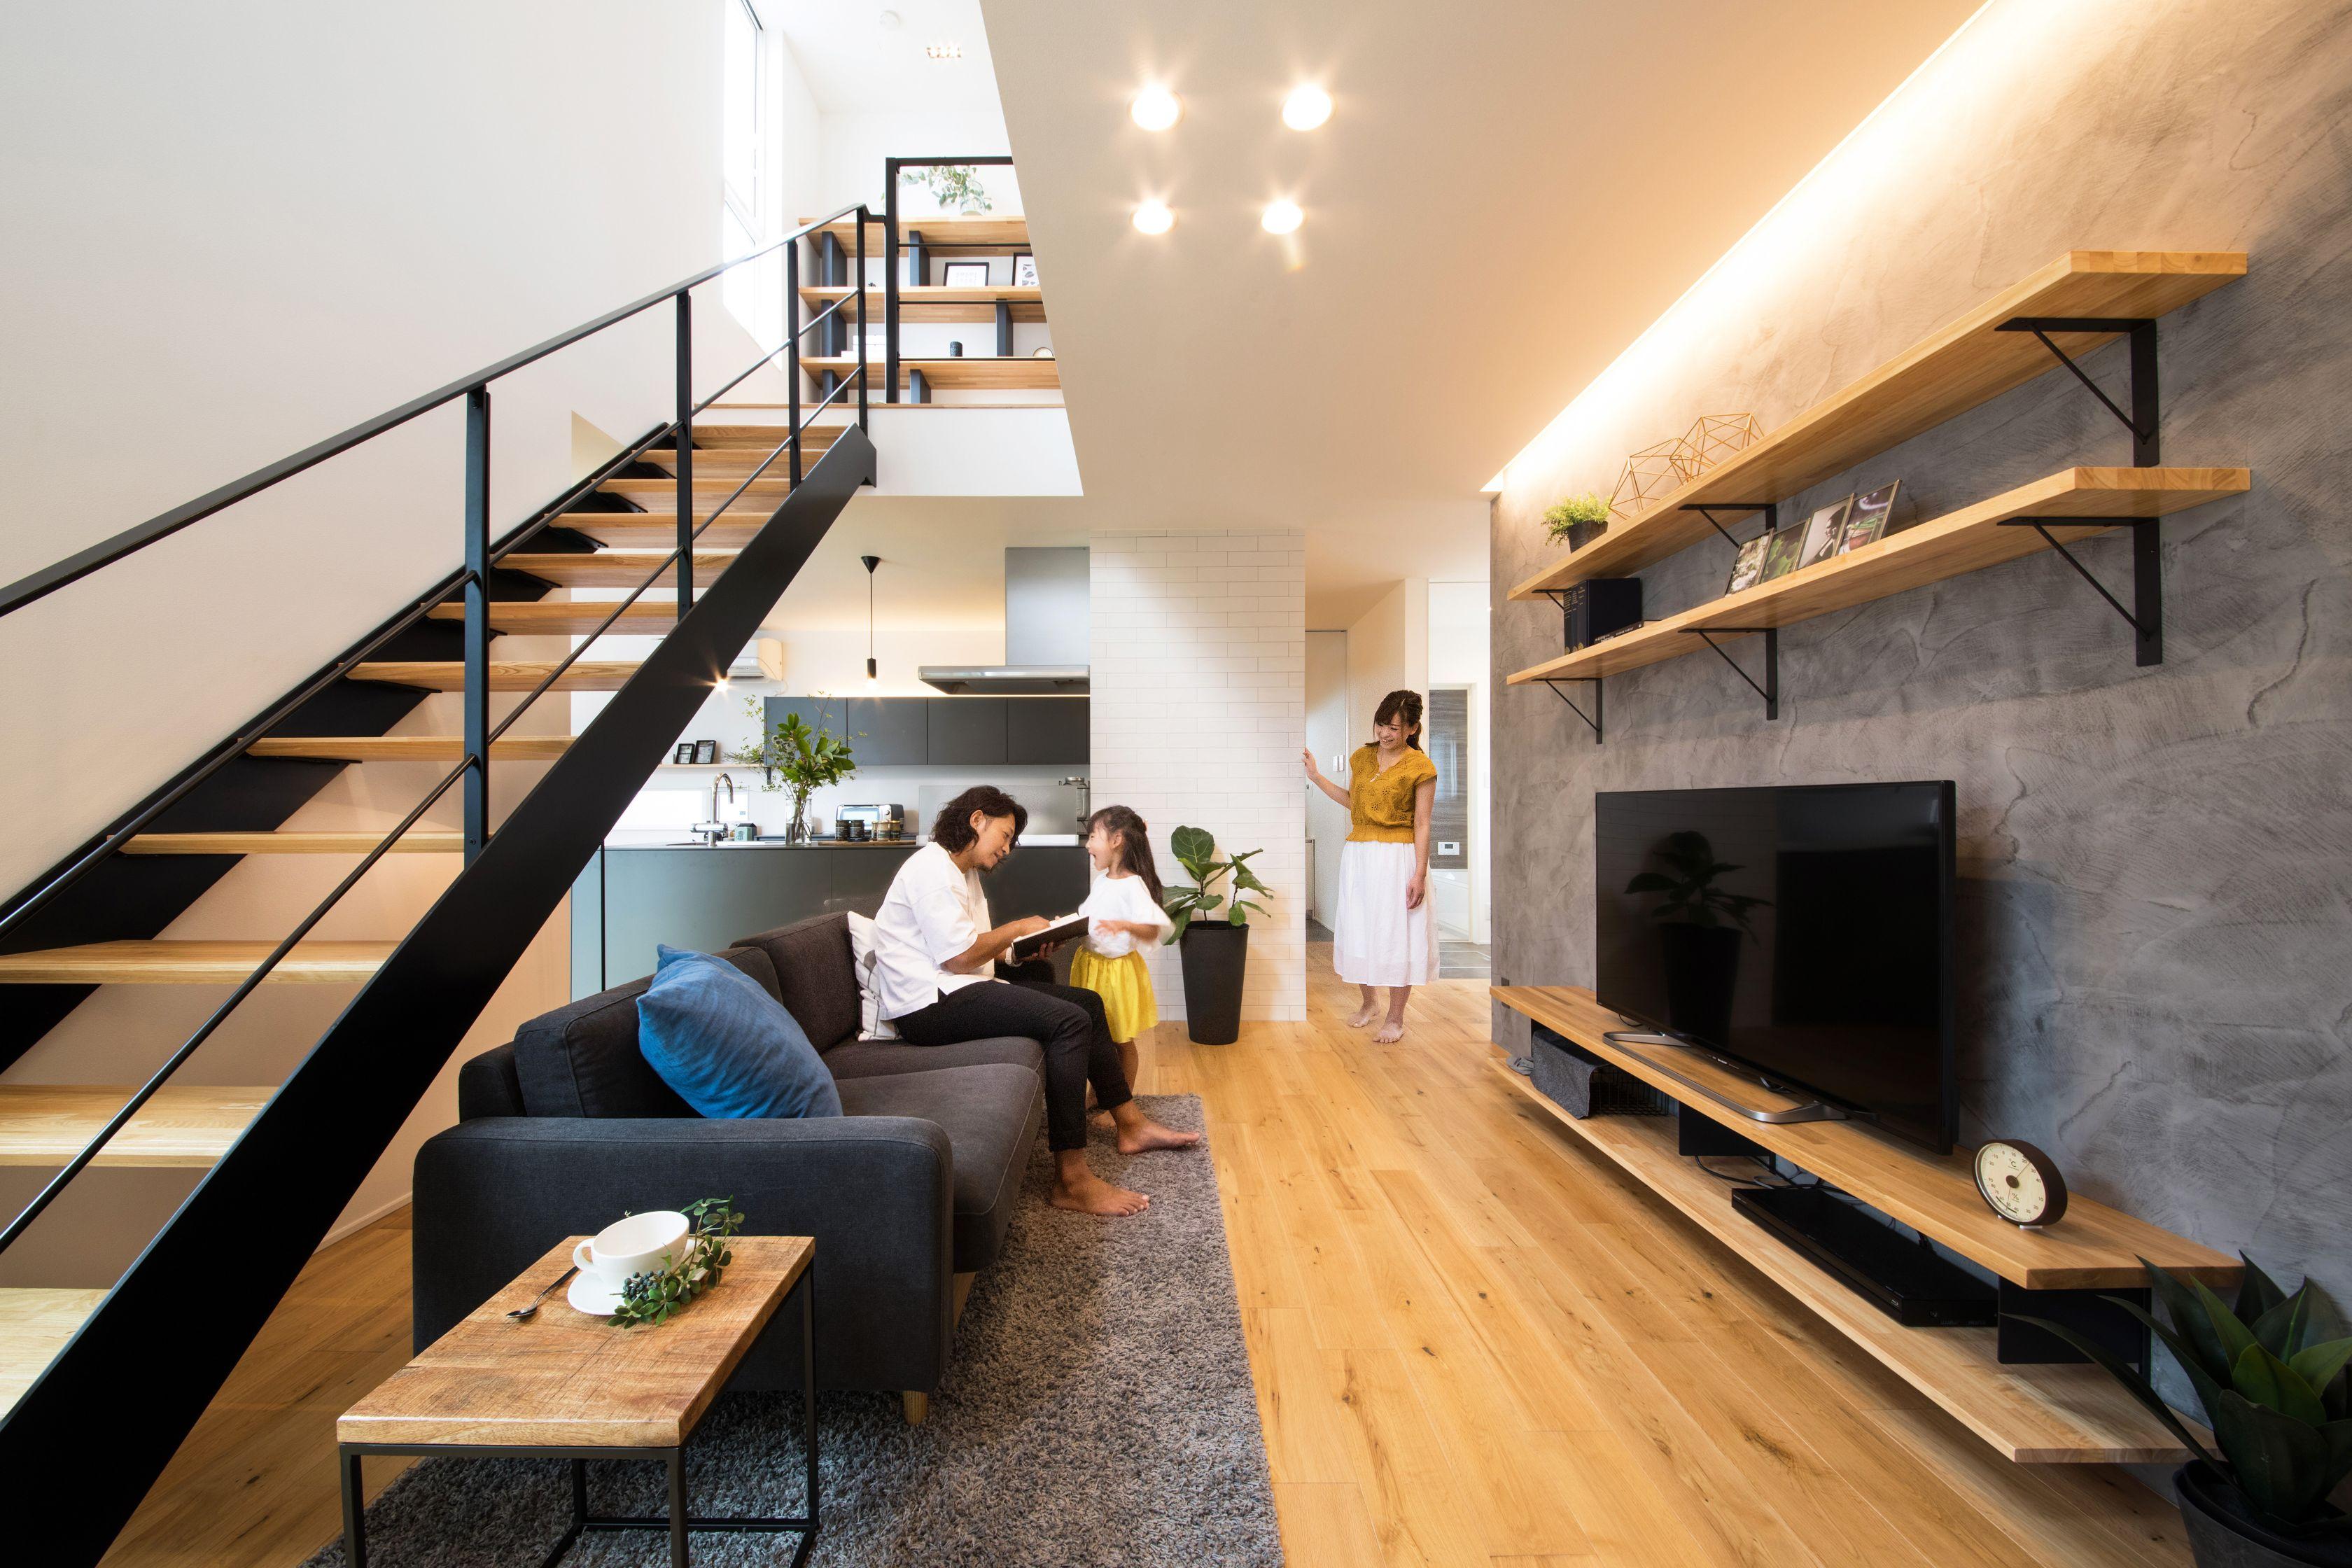 RIKYU (リキュー)【西尾市熊味町山畔65-9・モデルハウス】周囲と調和の取れたスクエアの外観。環境を考慮し窓は小さく人目を気にせず暮らせるようにしている